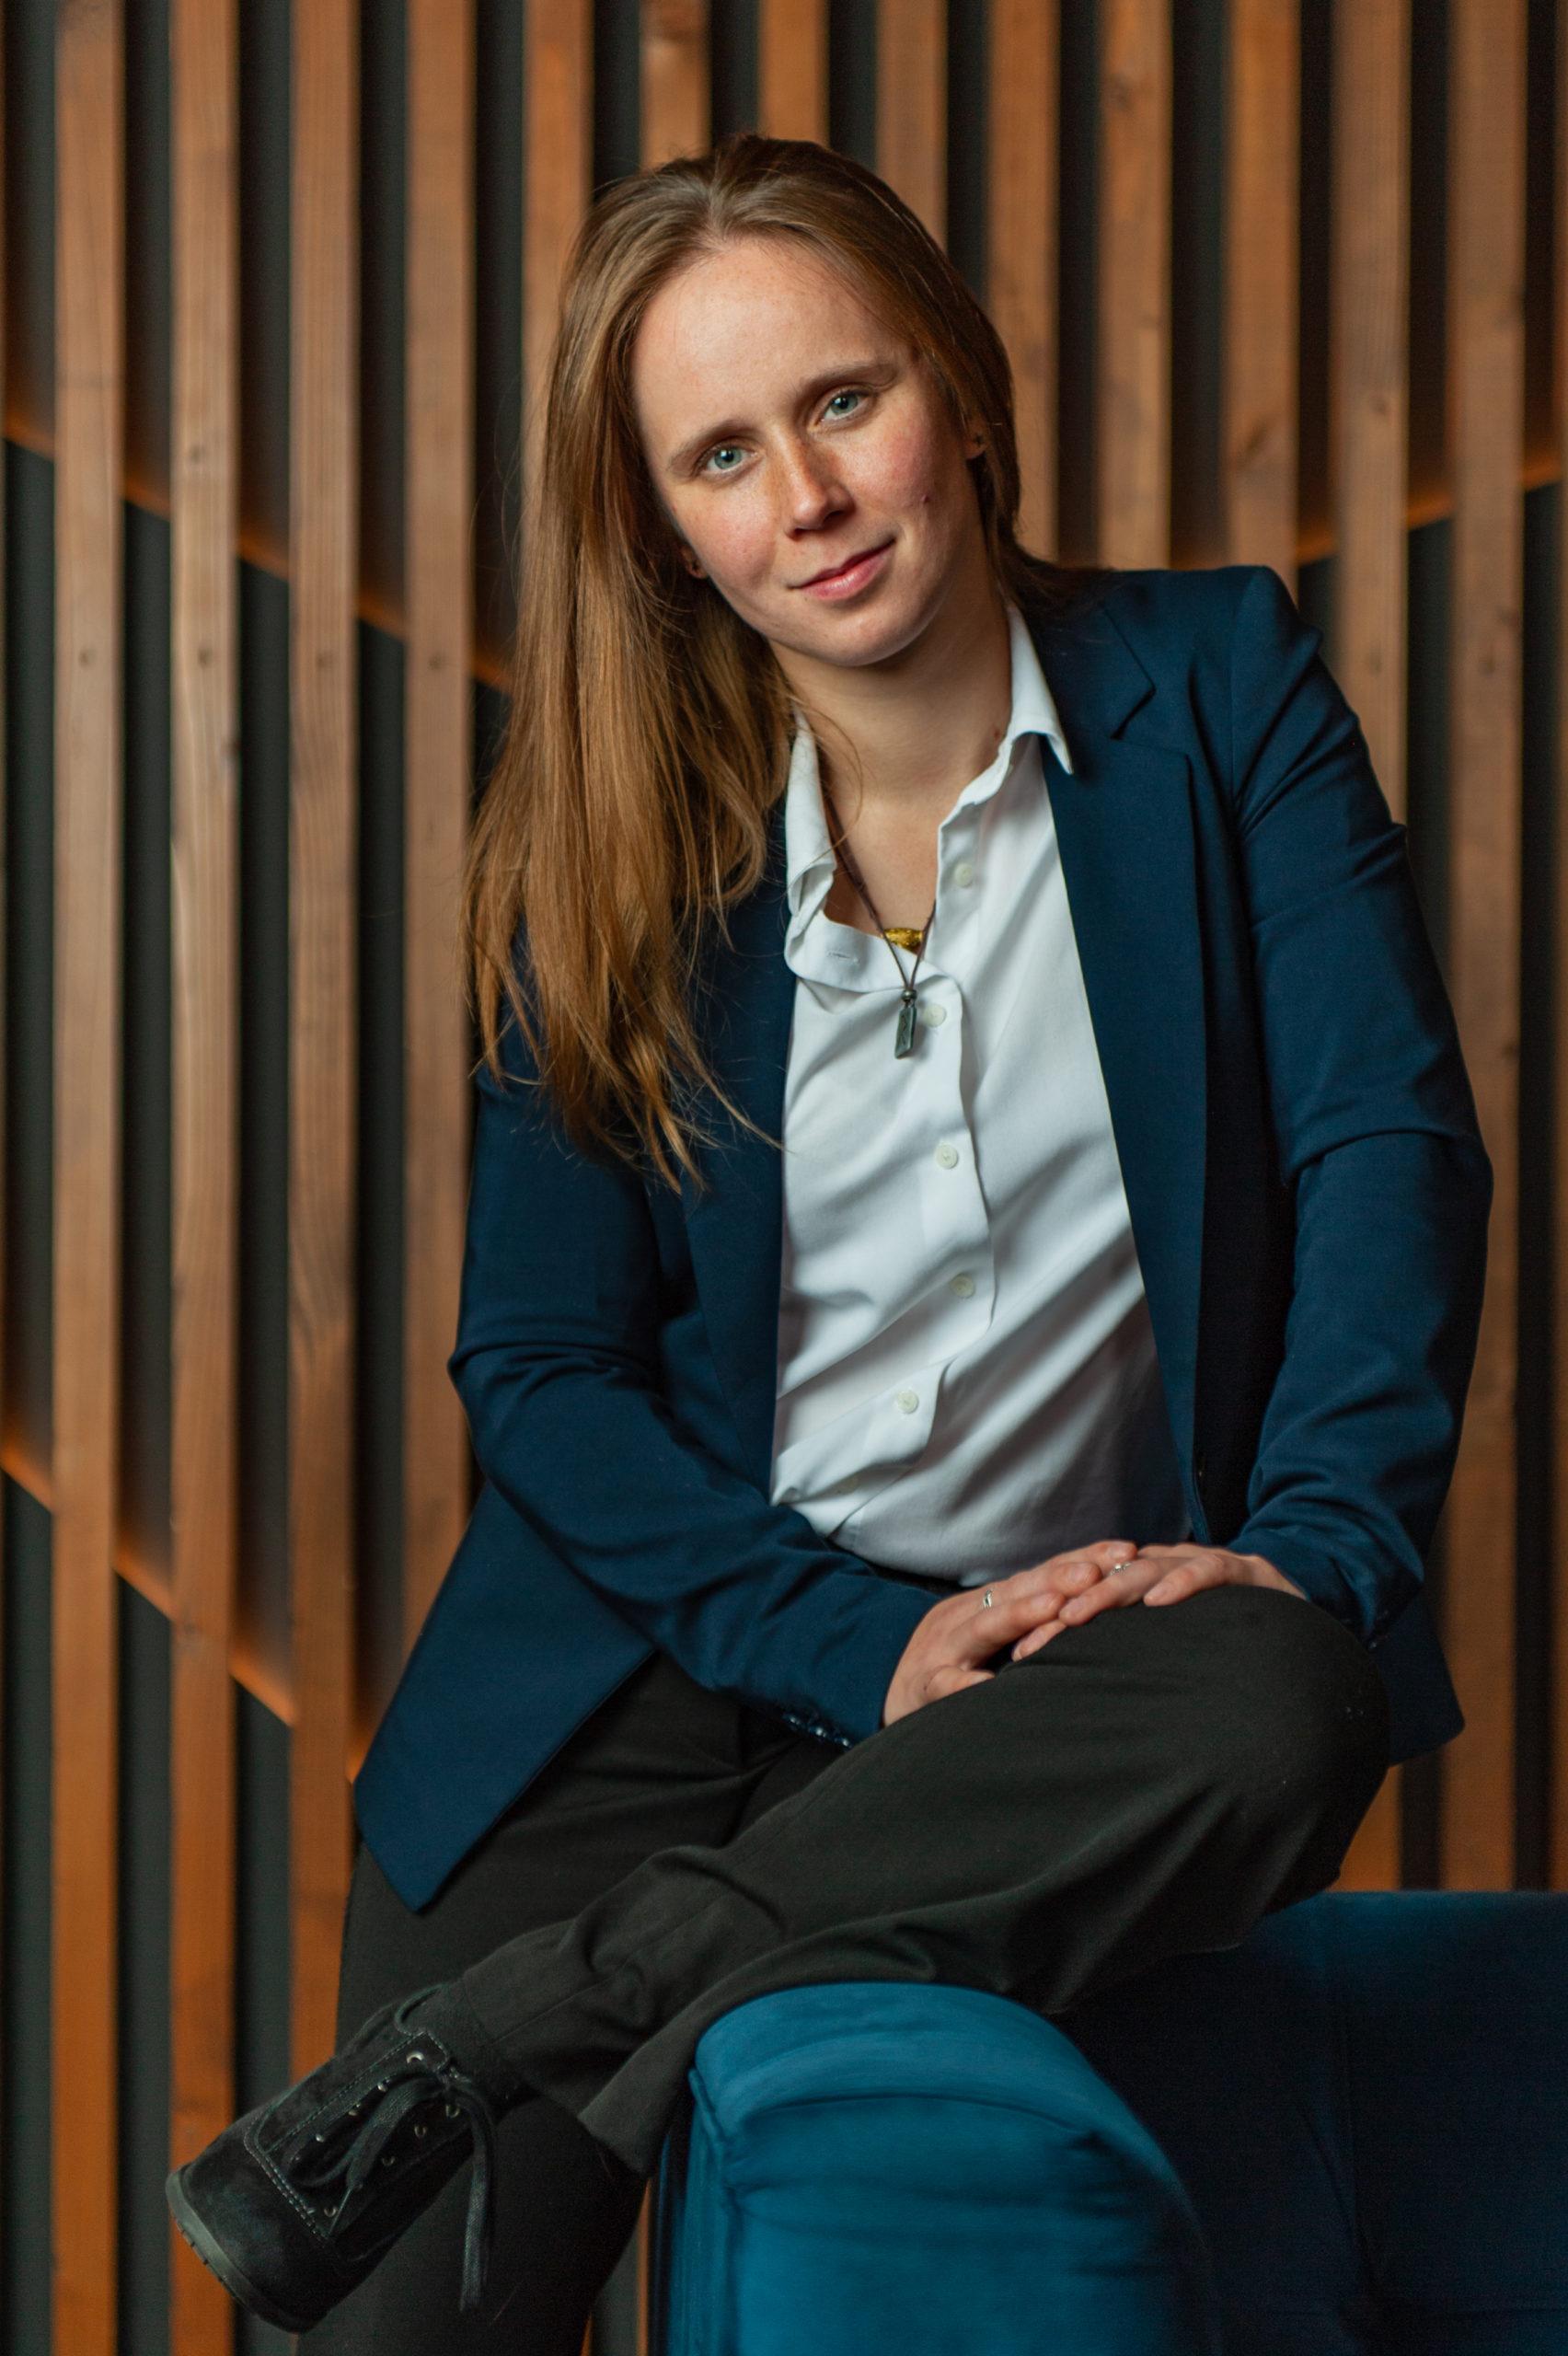 Сергеева Наталия - фото на личной странице